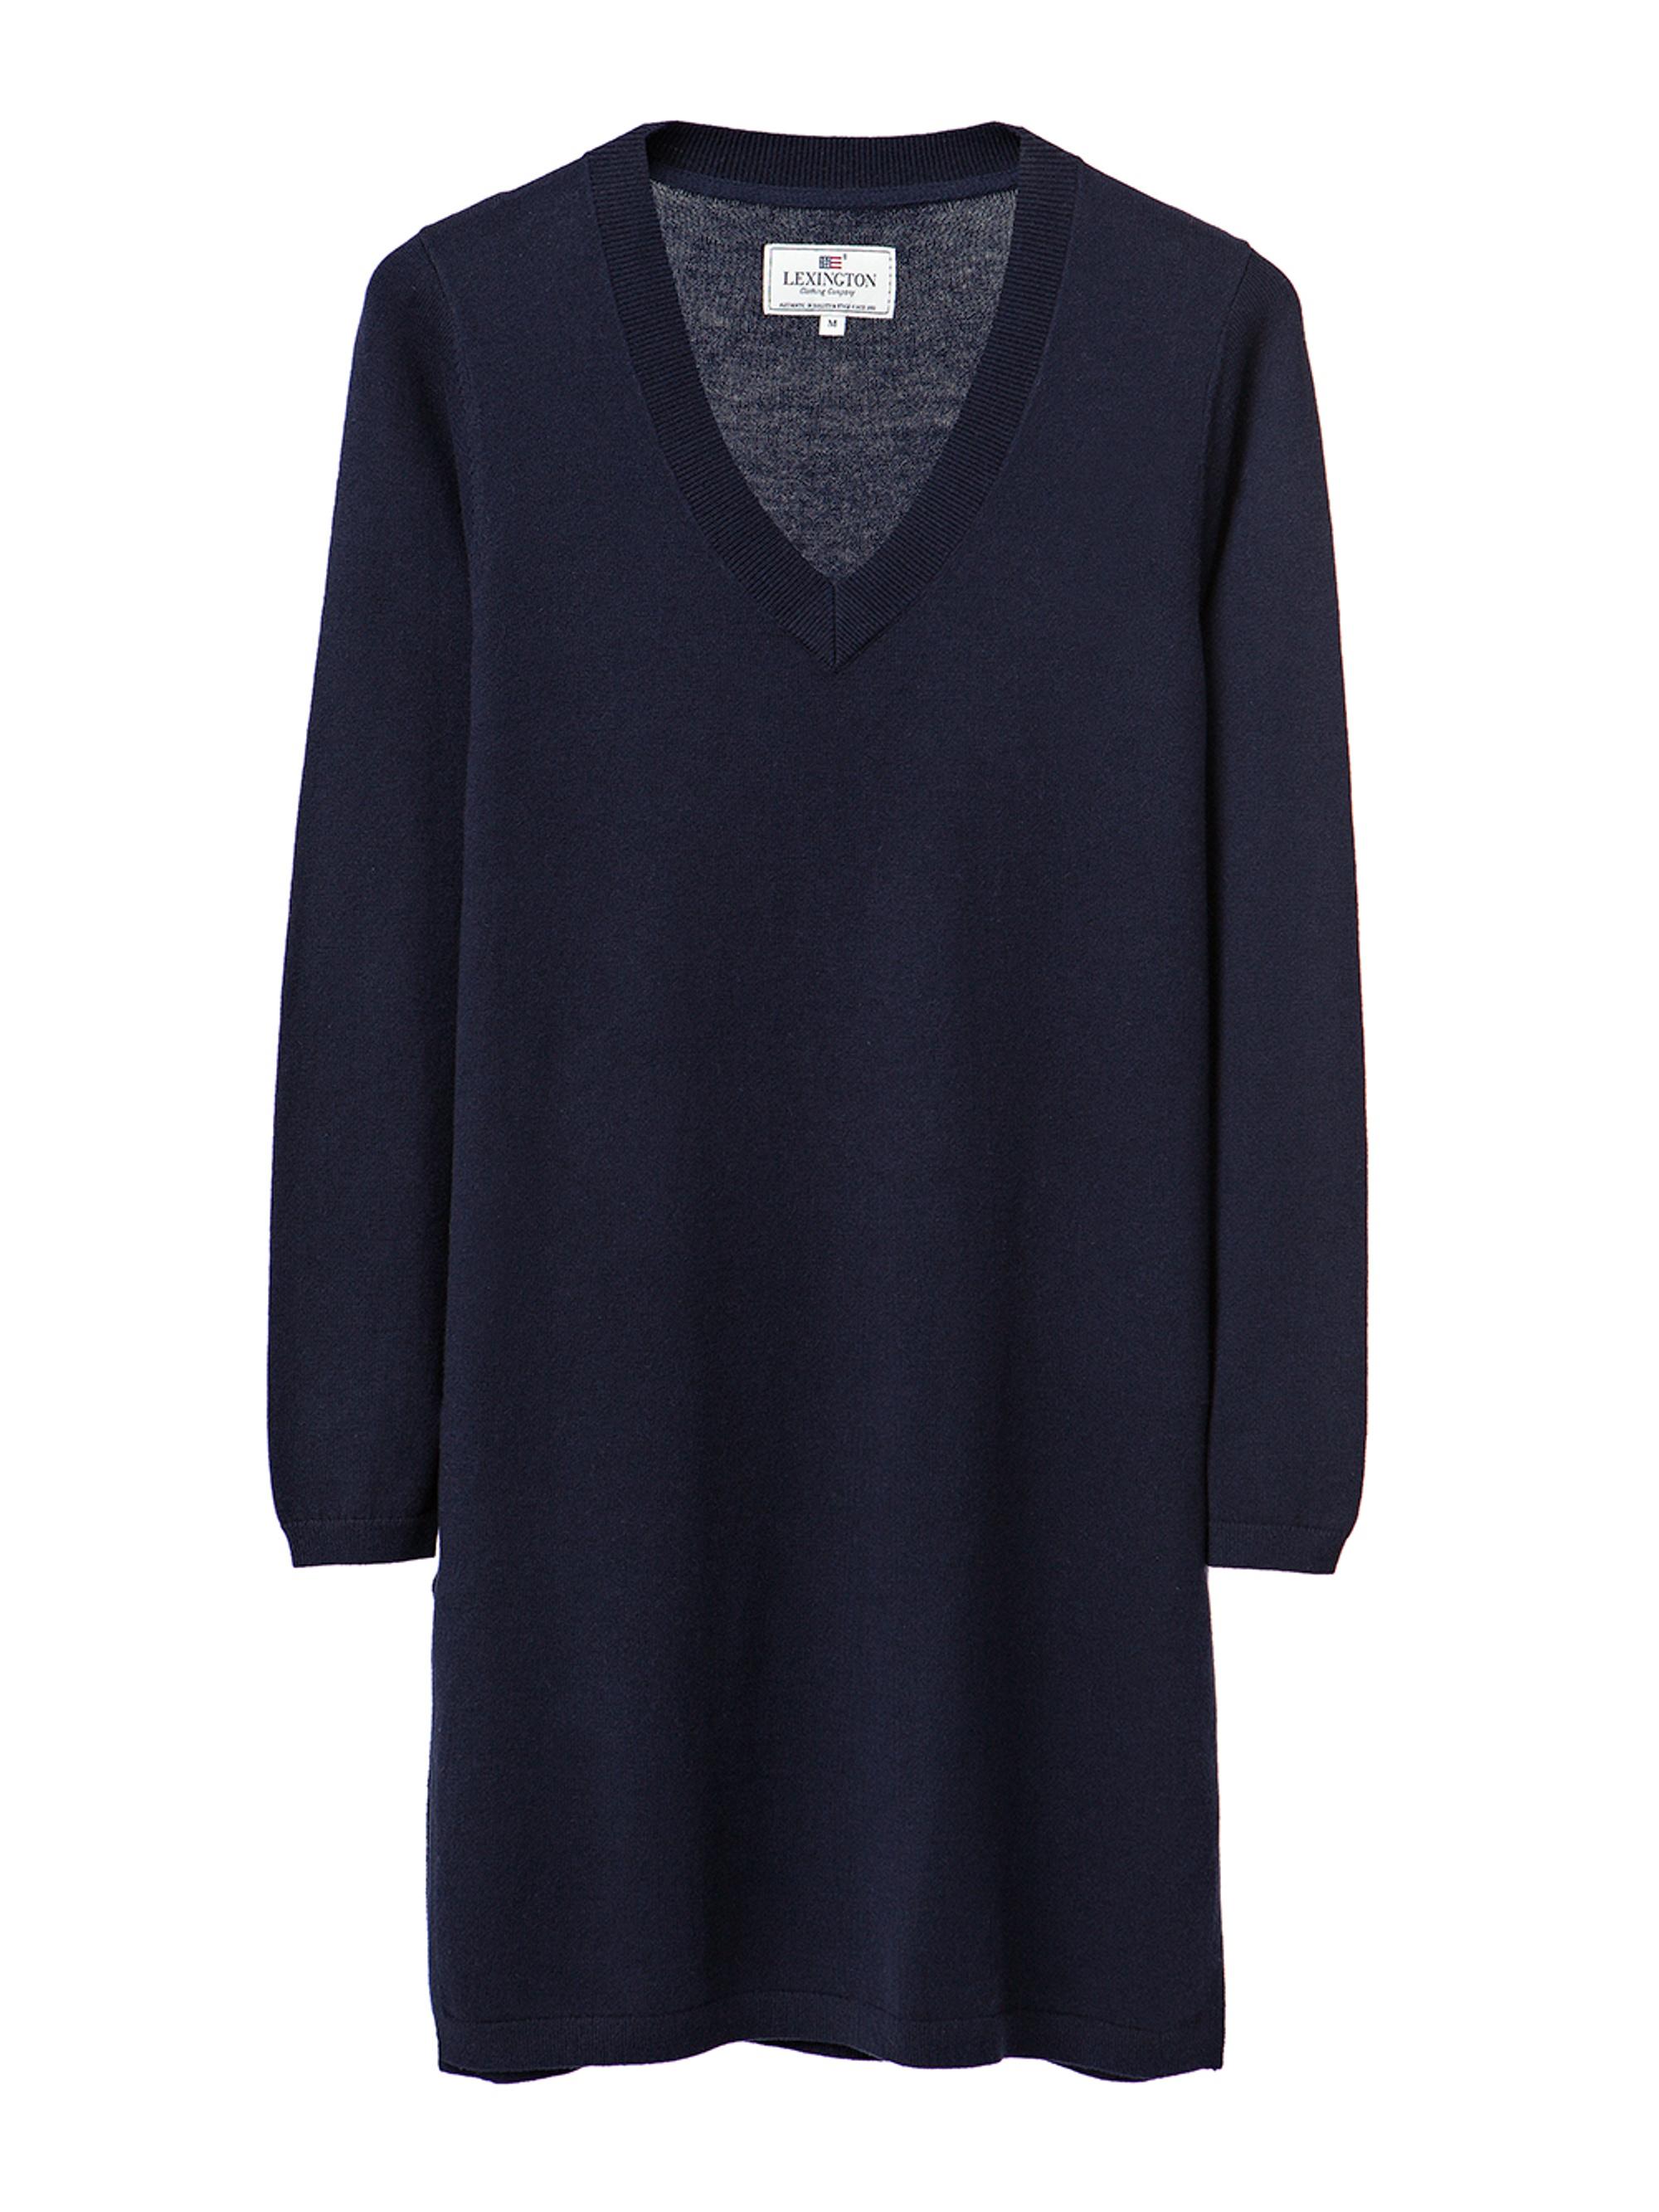 Eli Knit Tunic, Deep Marine Blue